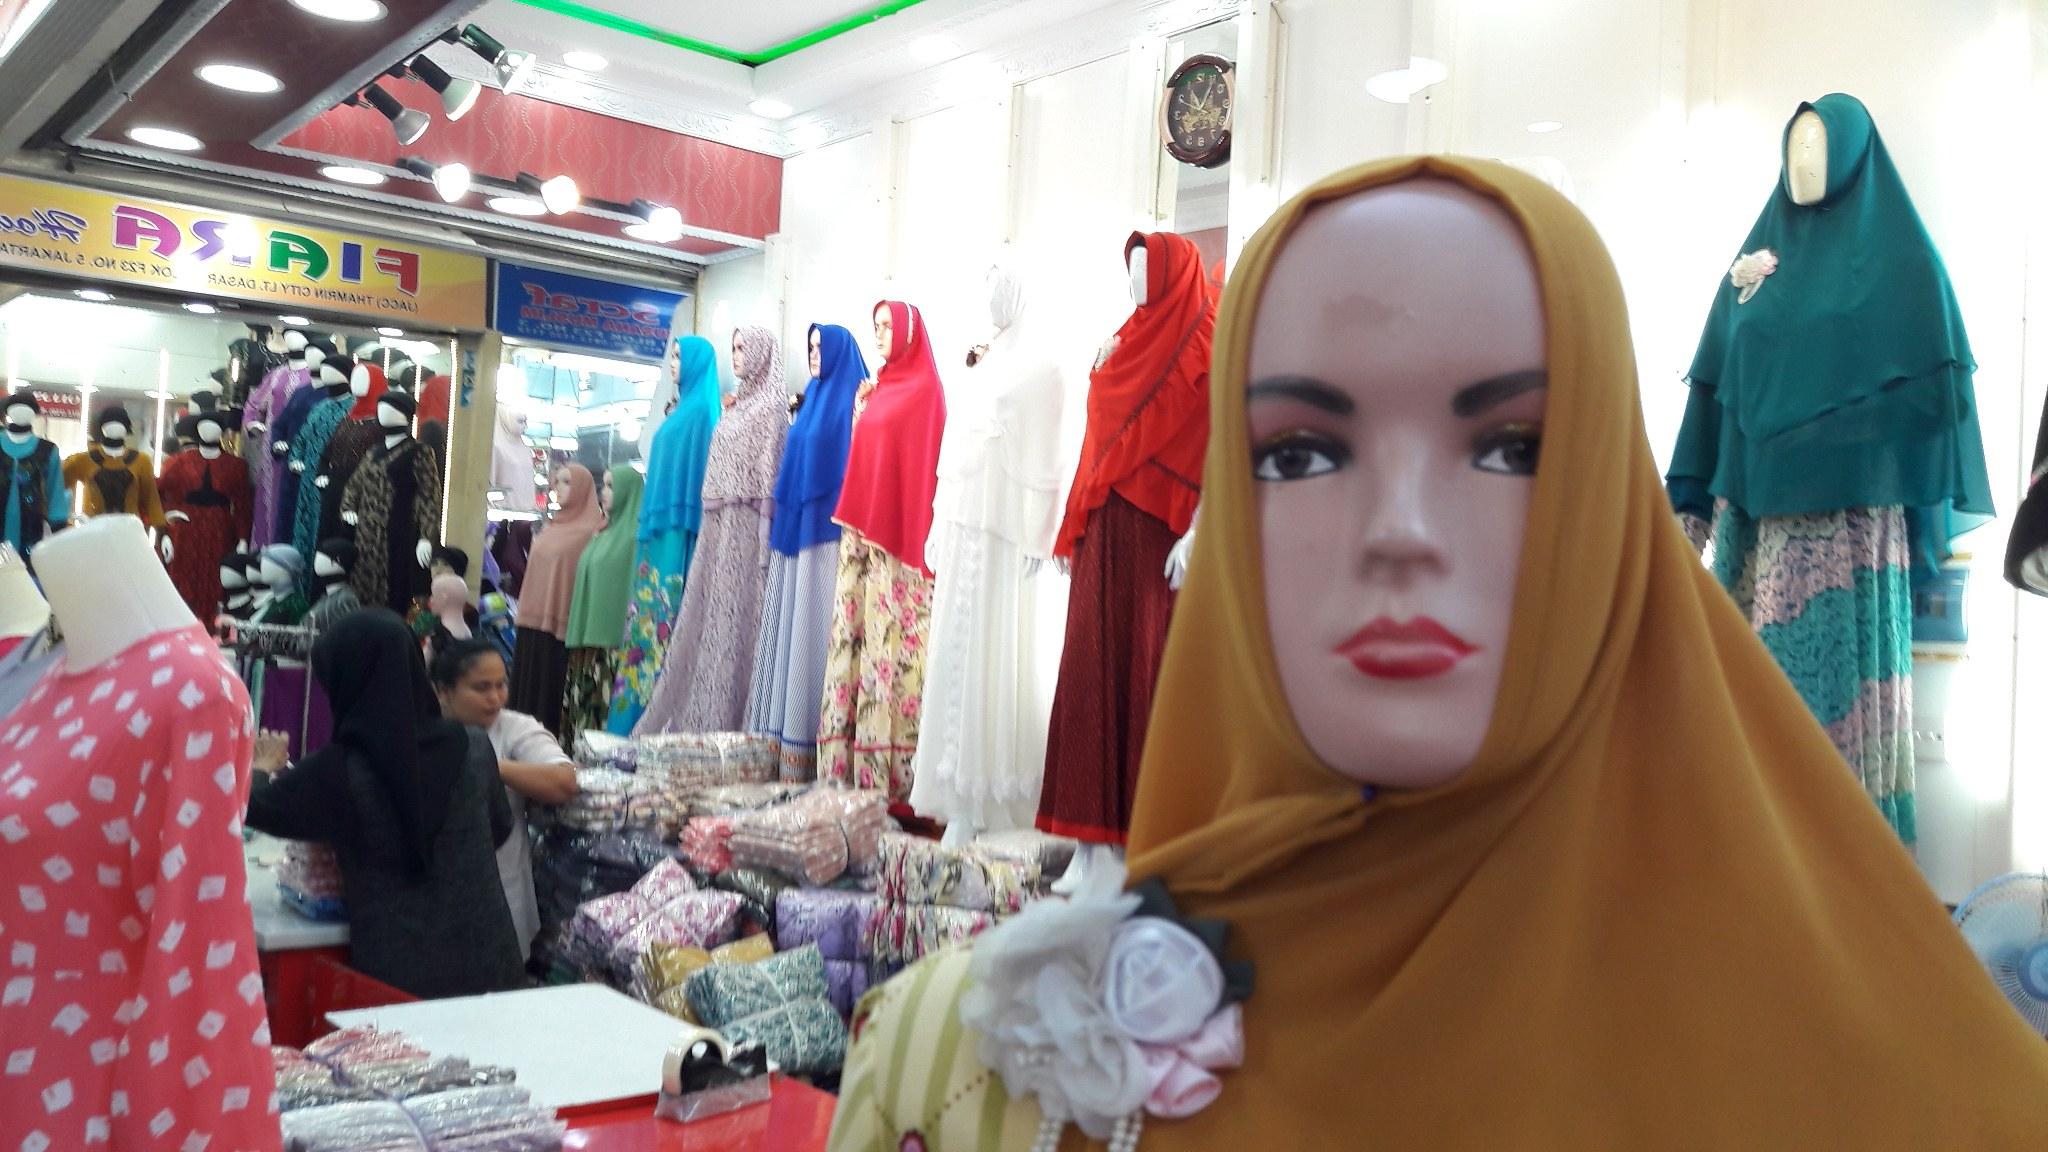 Inspirasi Cari Baju Lebaran Drdp Model Baju Lebaran Di Thamrin City Mainmata Studio